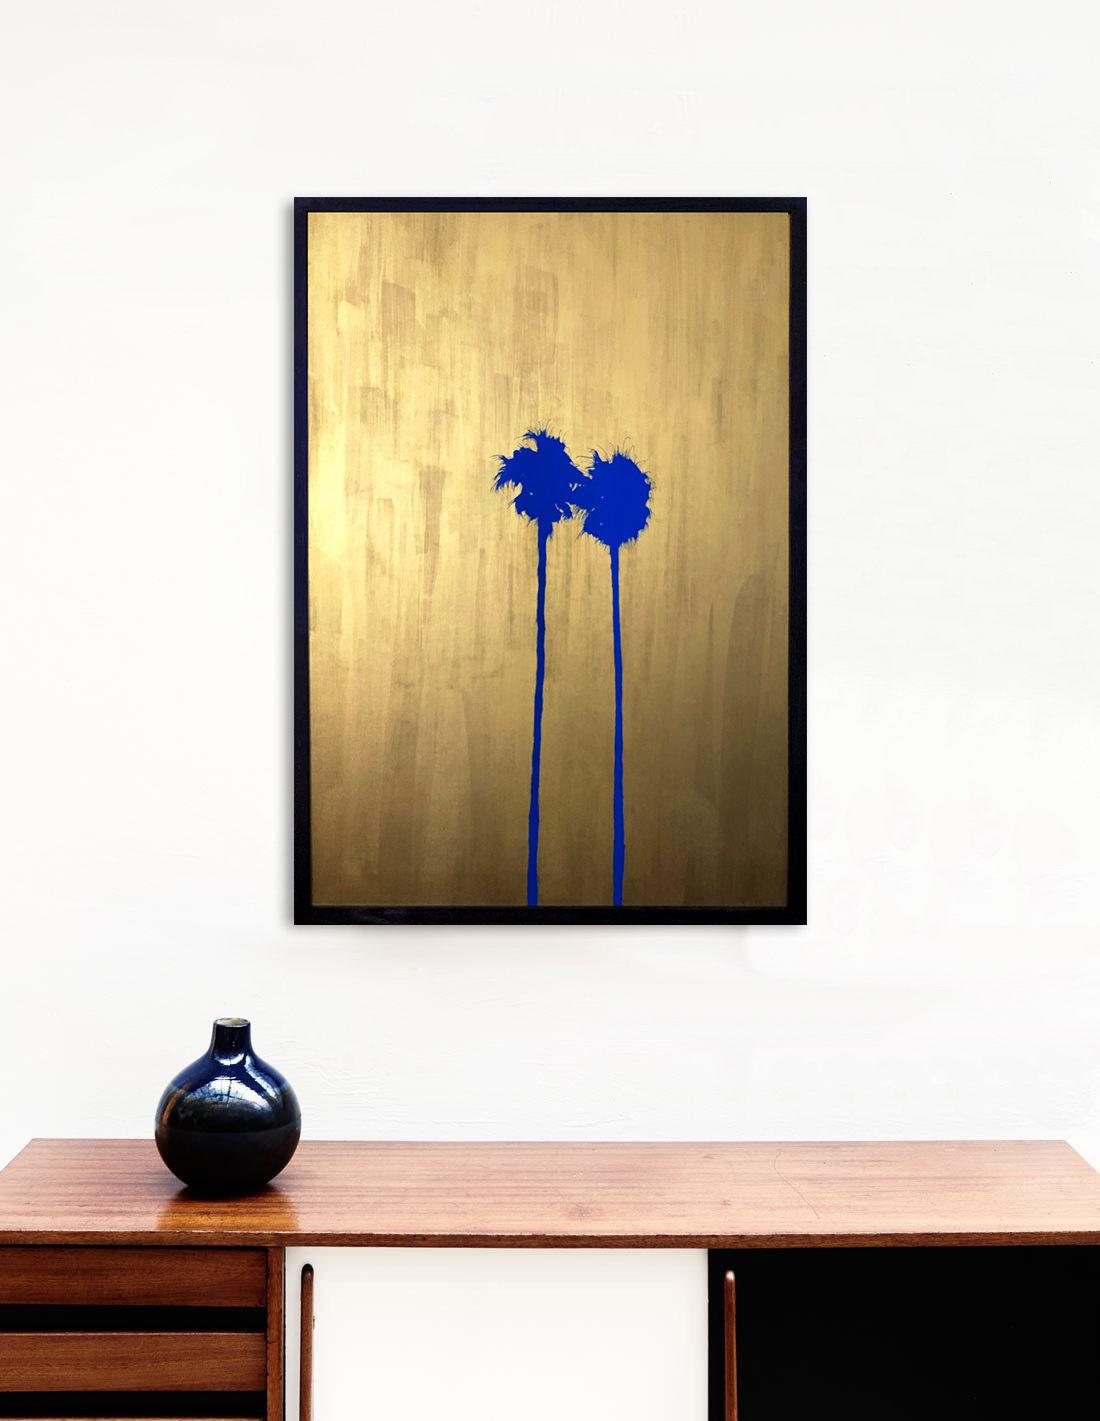 Giant palmtrees IV bleu- Tableau- Hubert Jouzeau